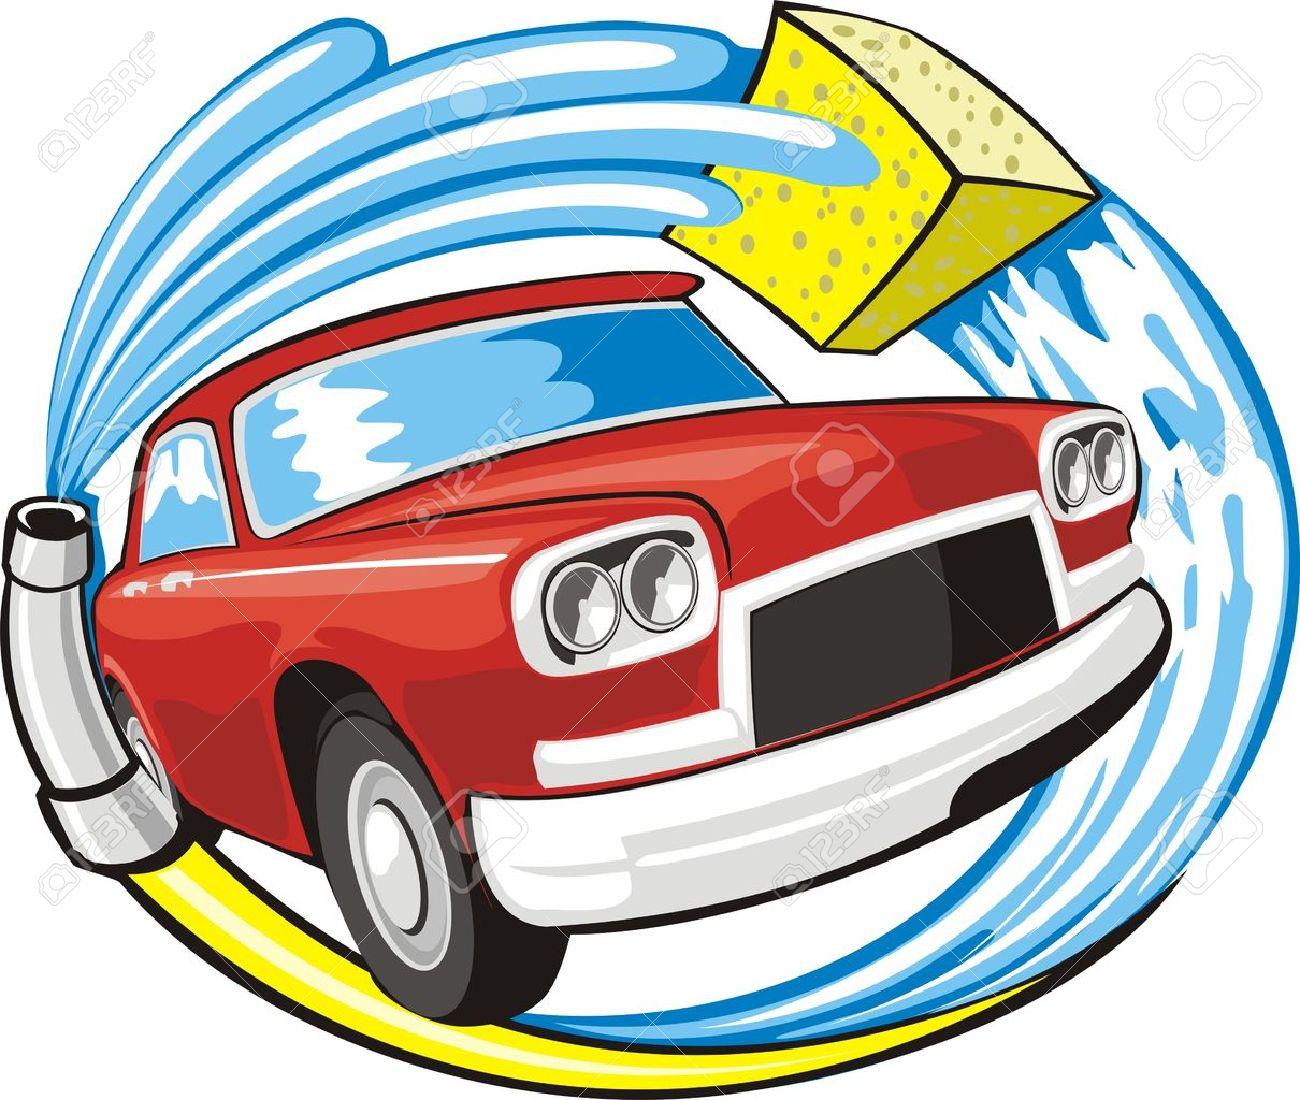 1300x1100 Vector Car Wash Clipart, Explore Pictures